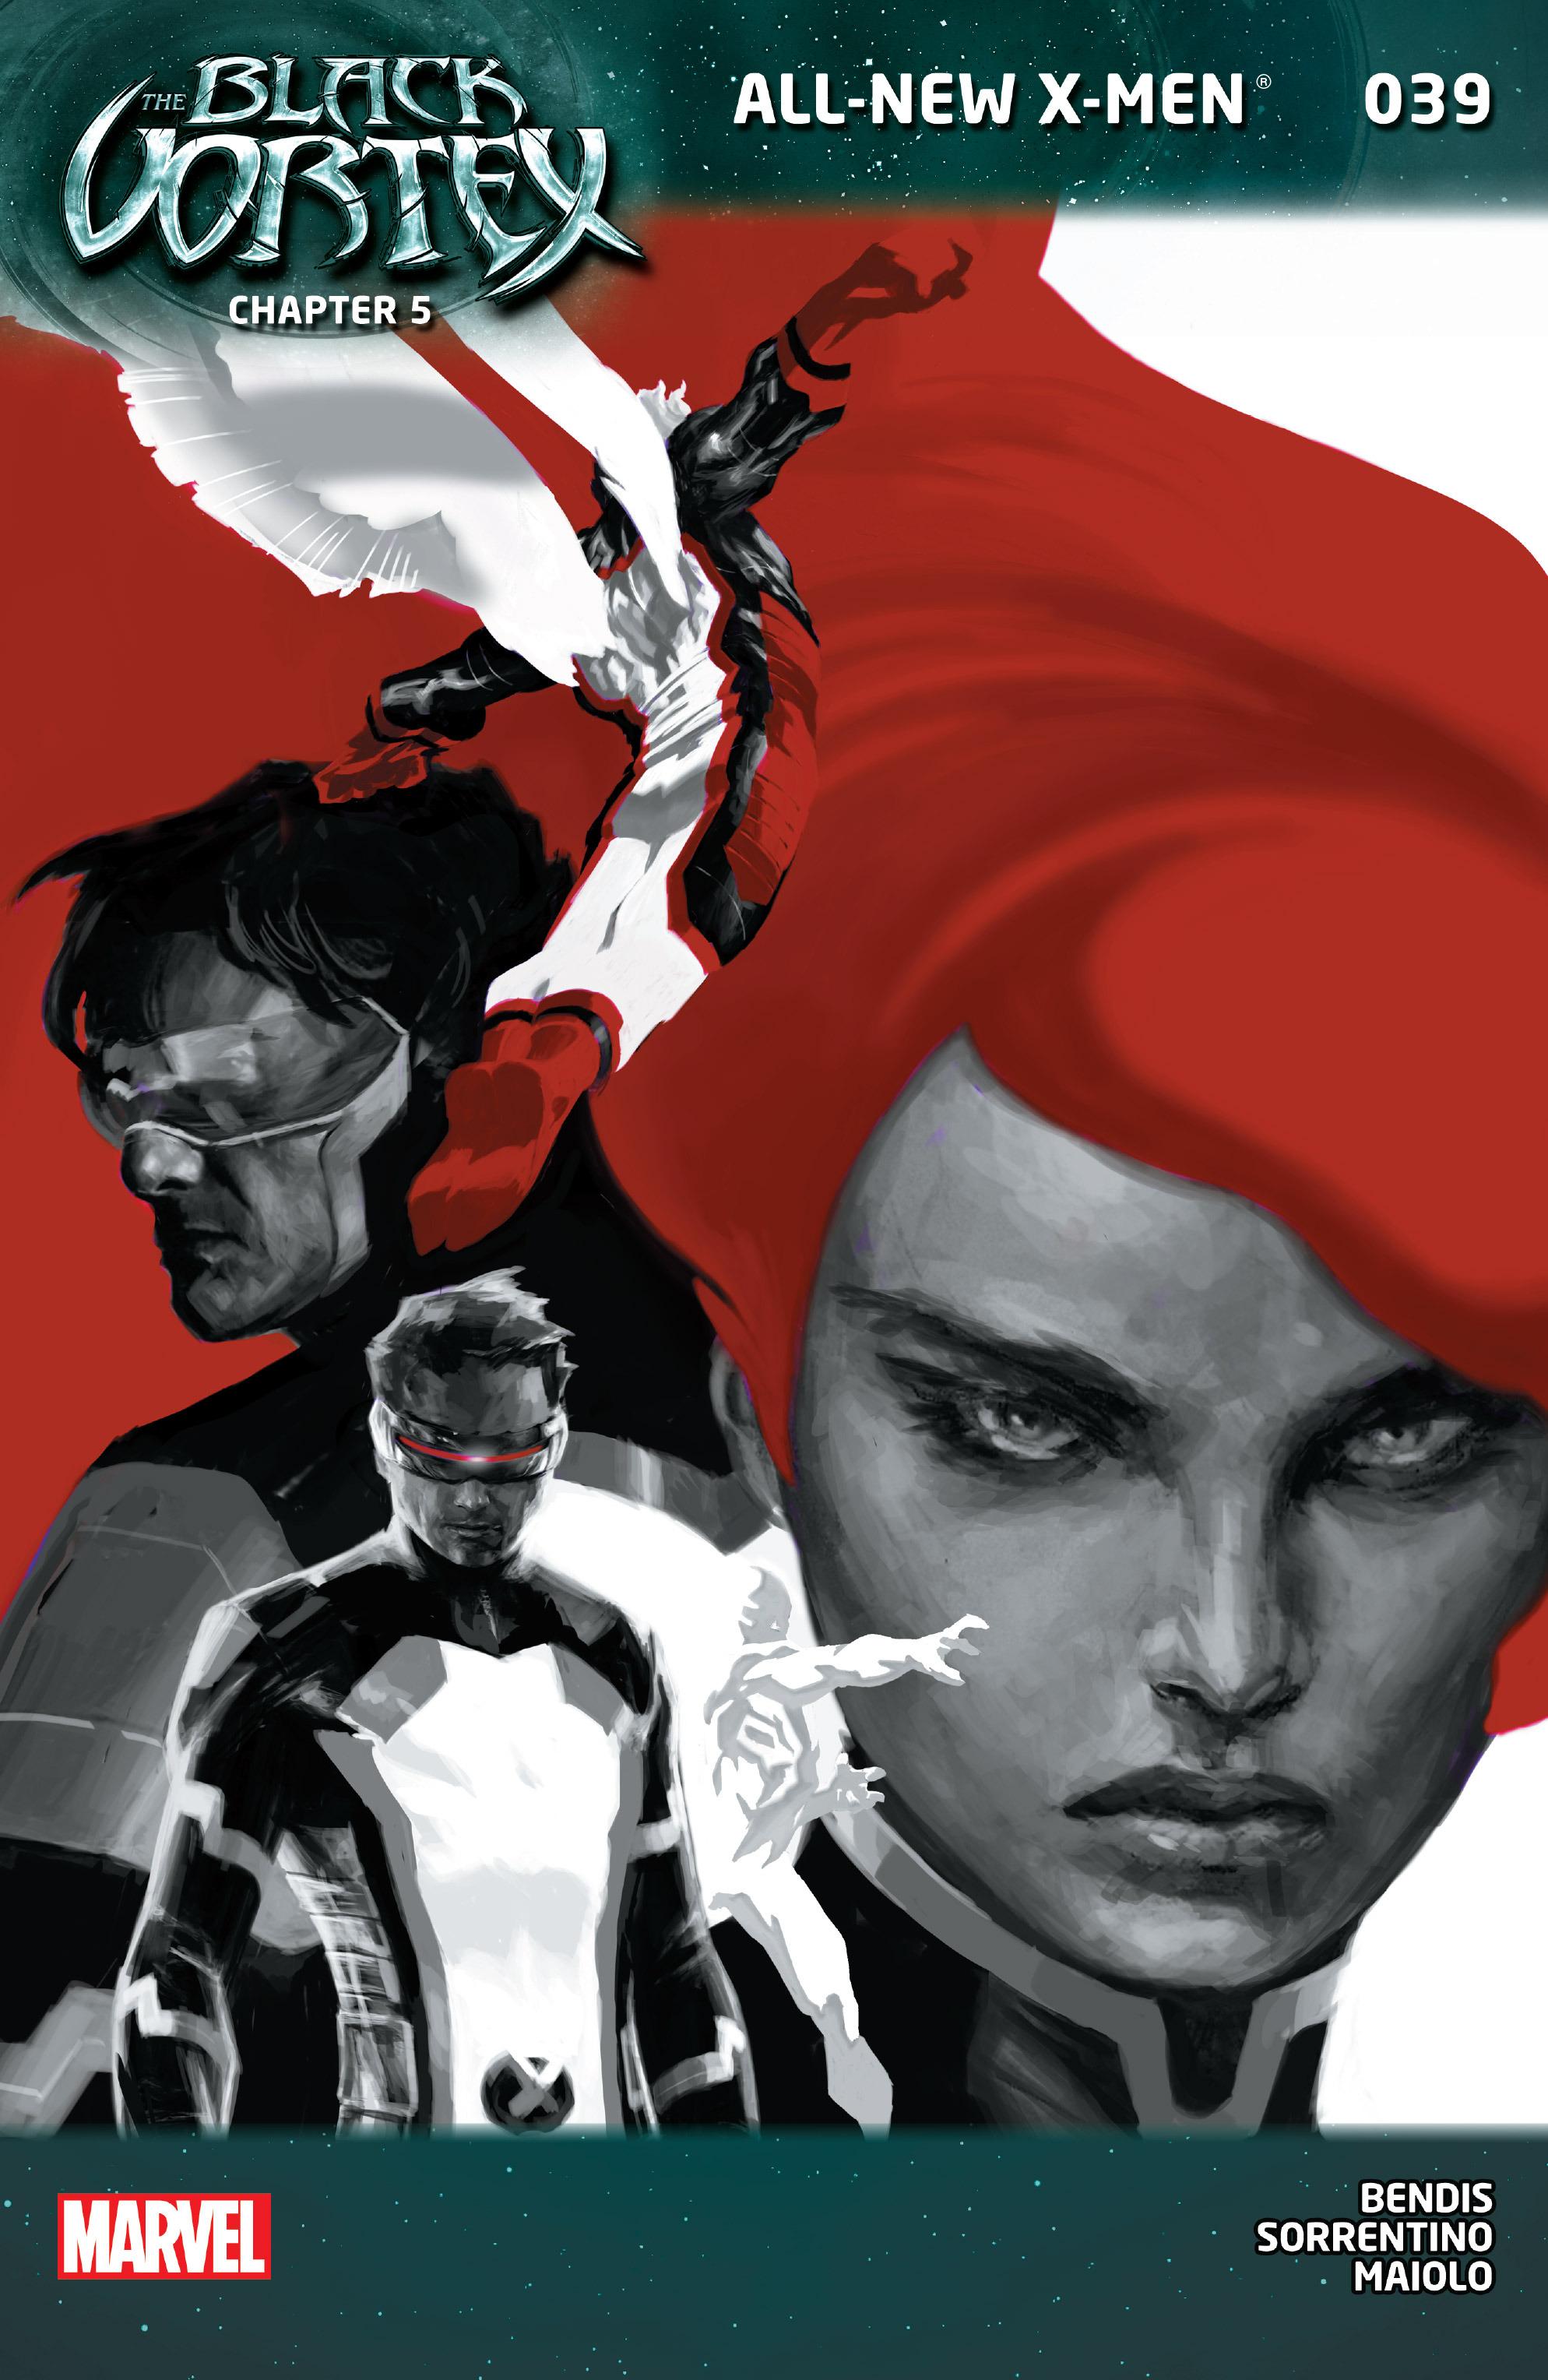 All-New X-Men (2013) chap 39 pic 1